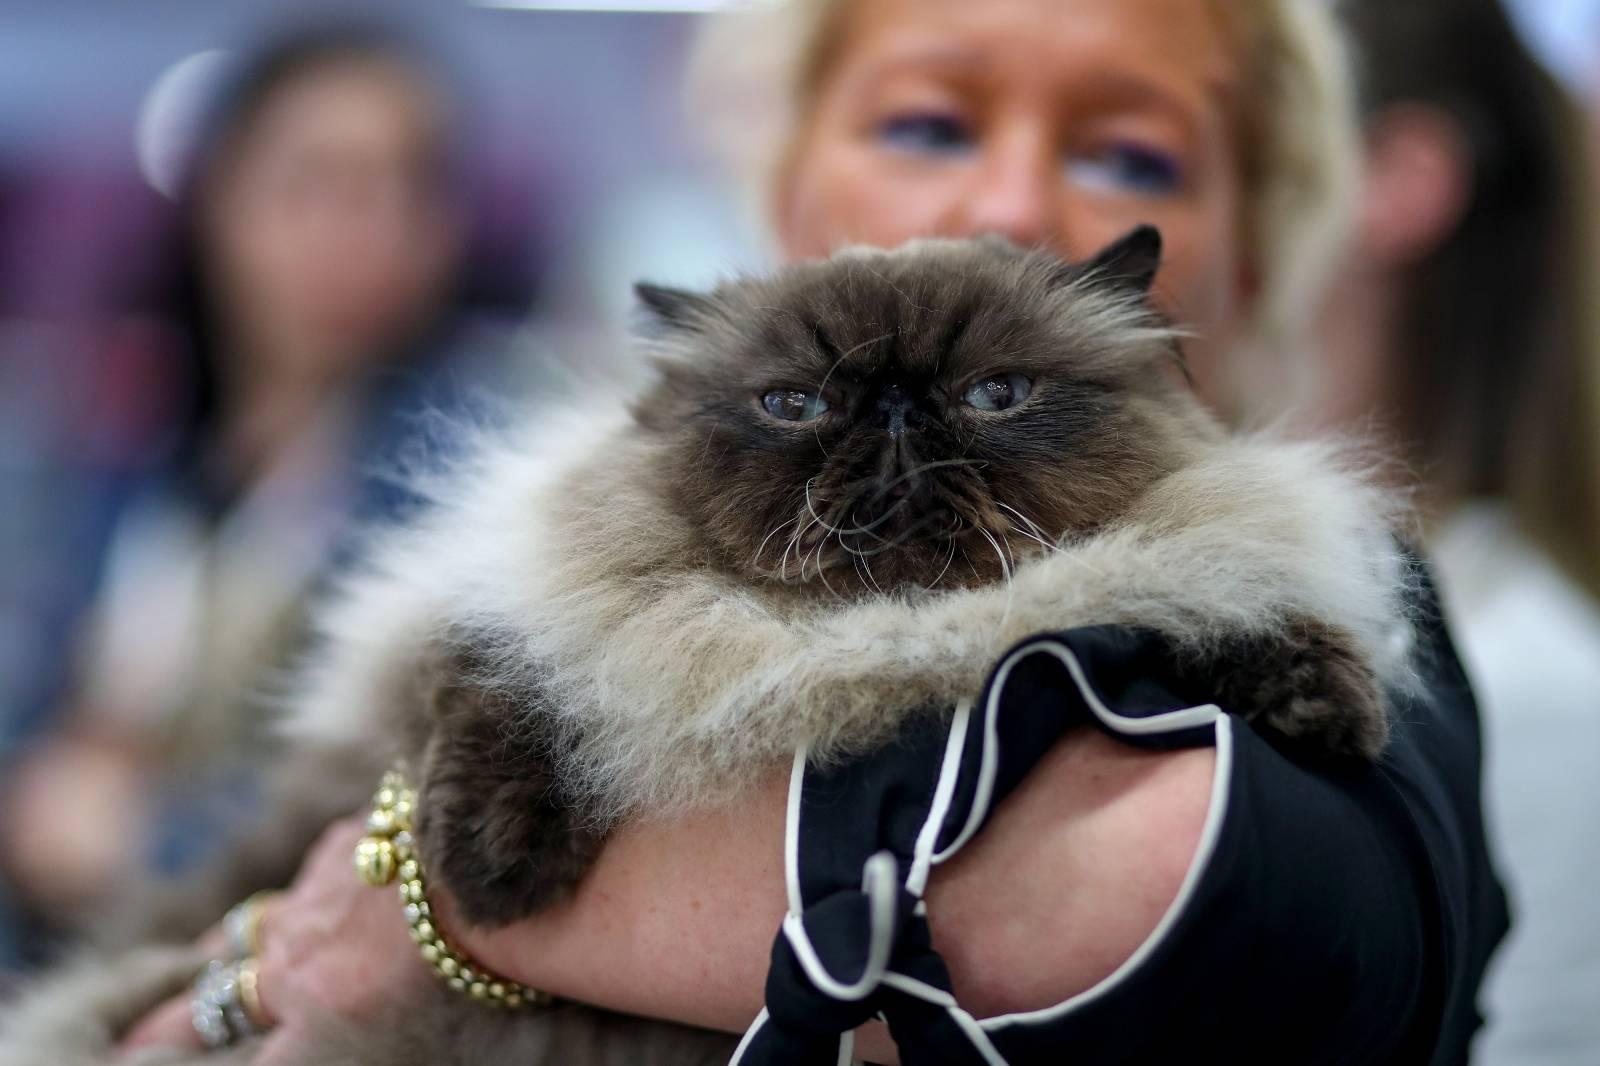 Zaprešić: Međunarodna izložba mačaka u trgovačkom centru Westgate